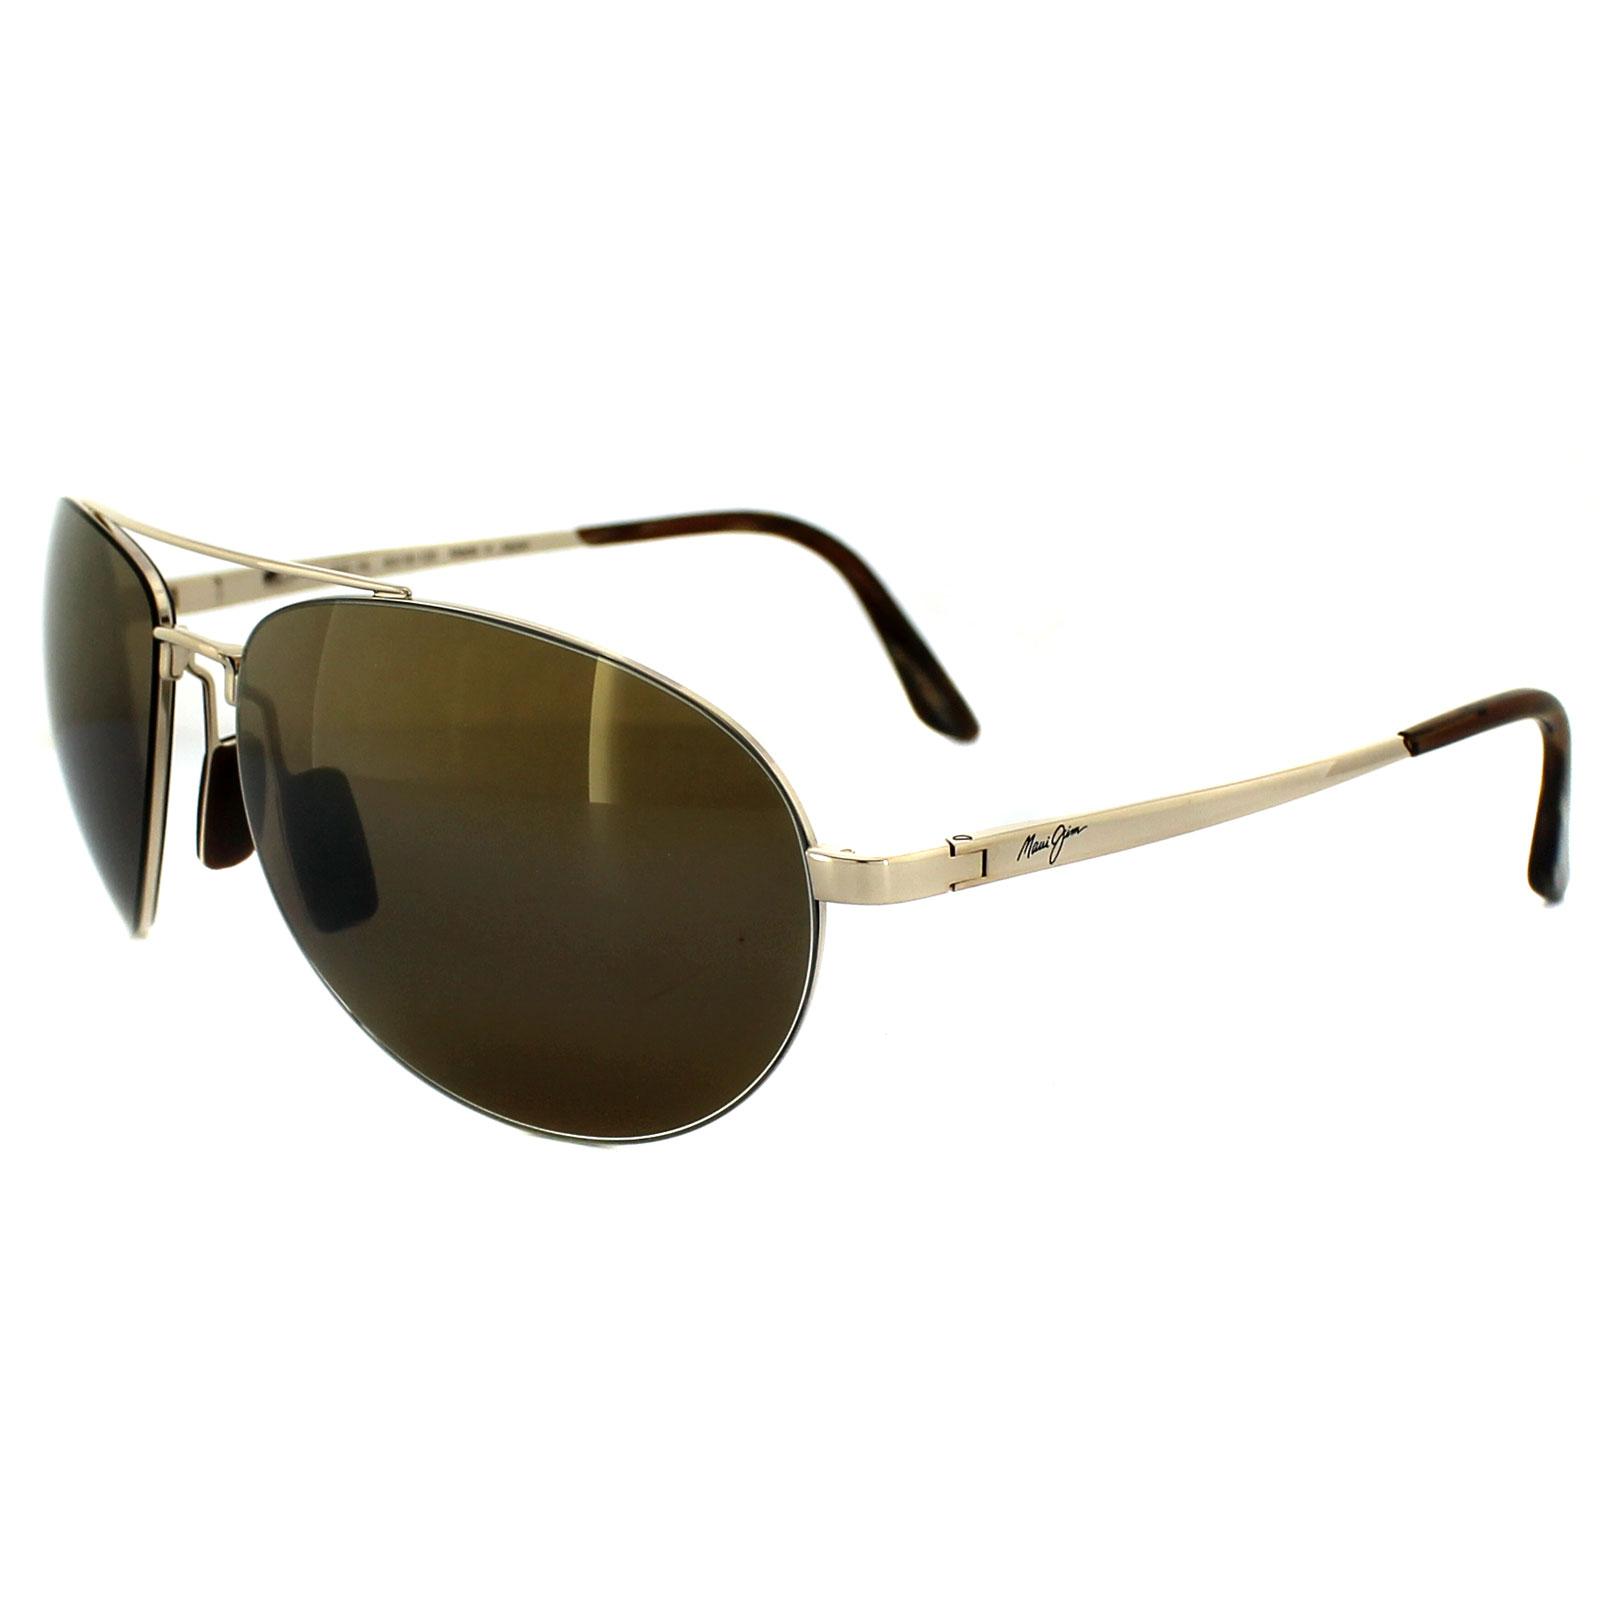 Maui Jim H210-16 Herren Sonnenbrille Y1z7ZR6hVP